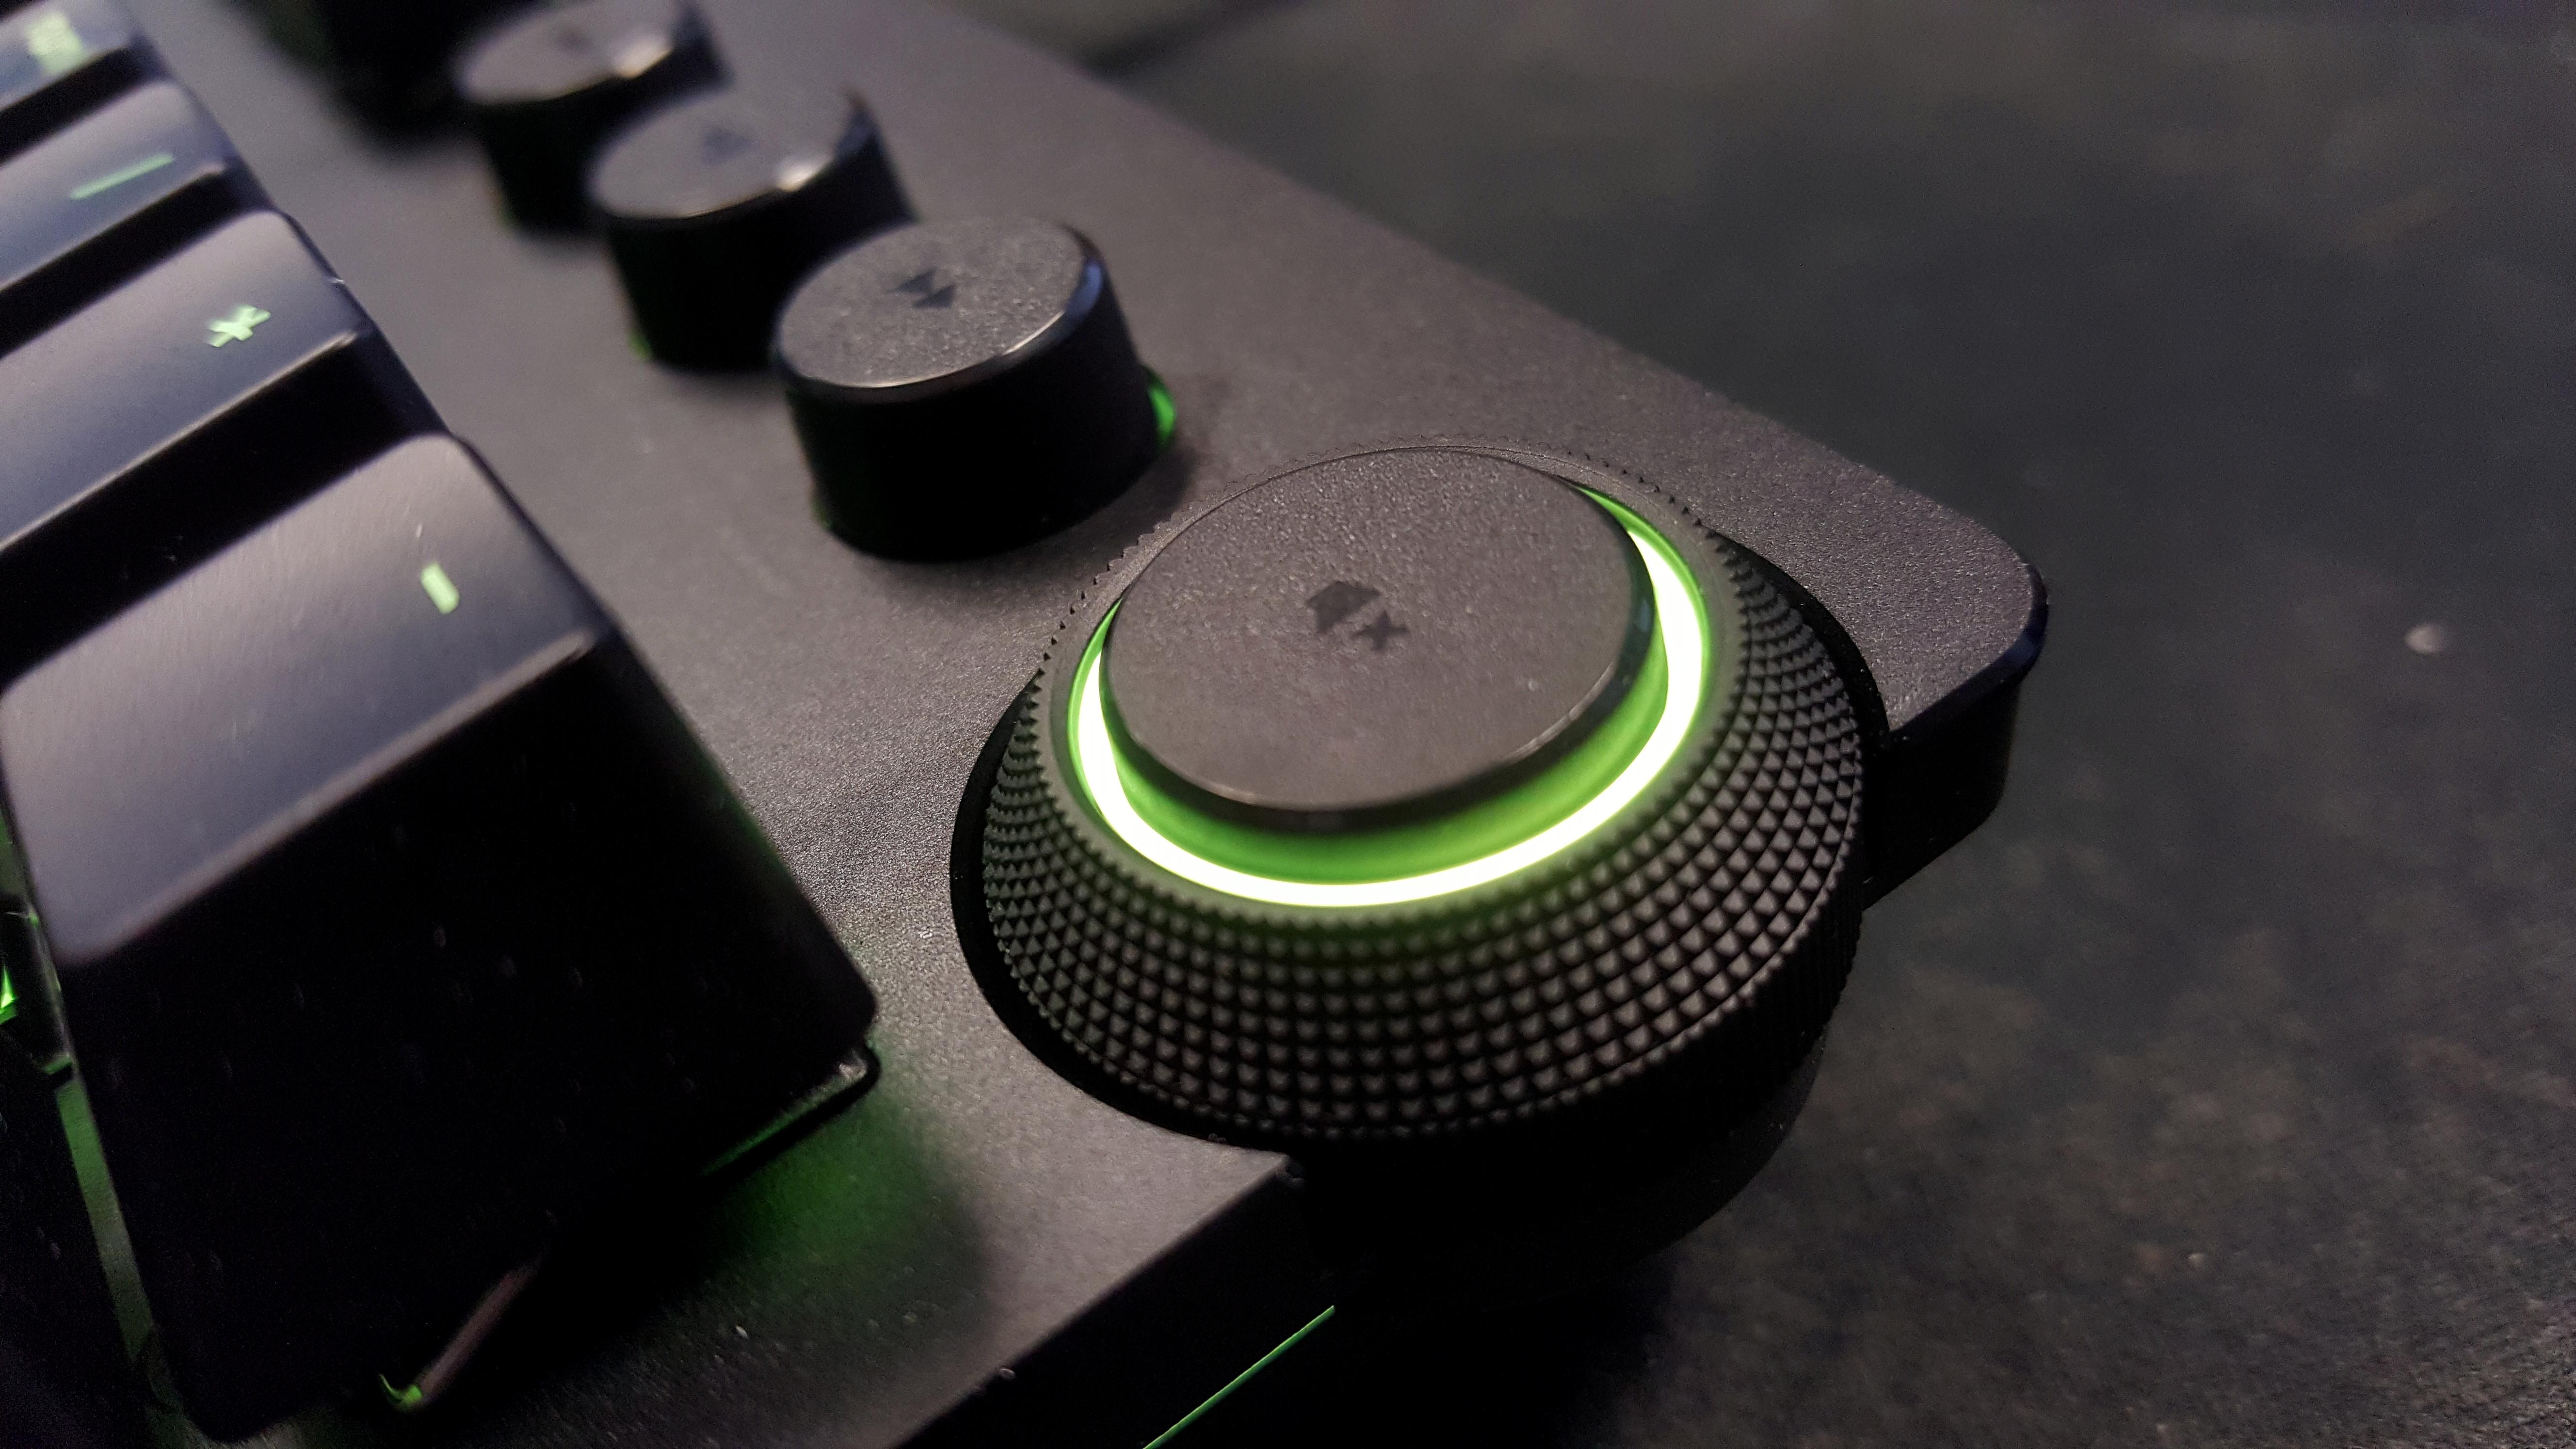 Razer Huntsman Elite review: a good gaming keyboard that